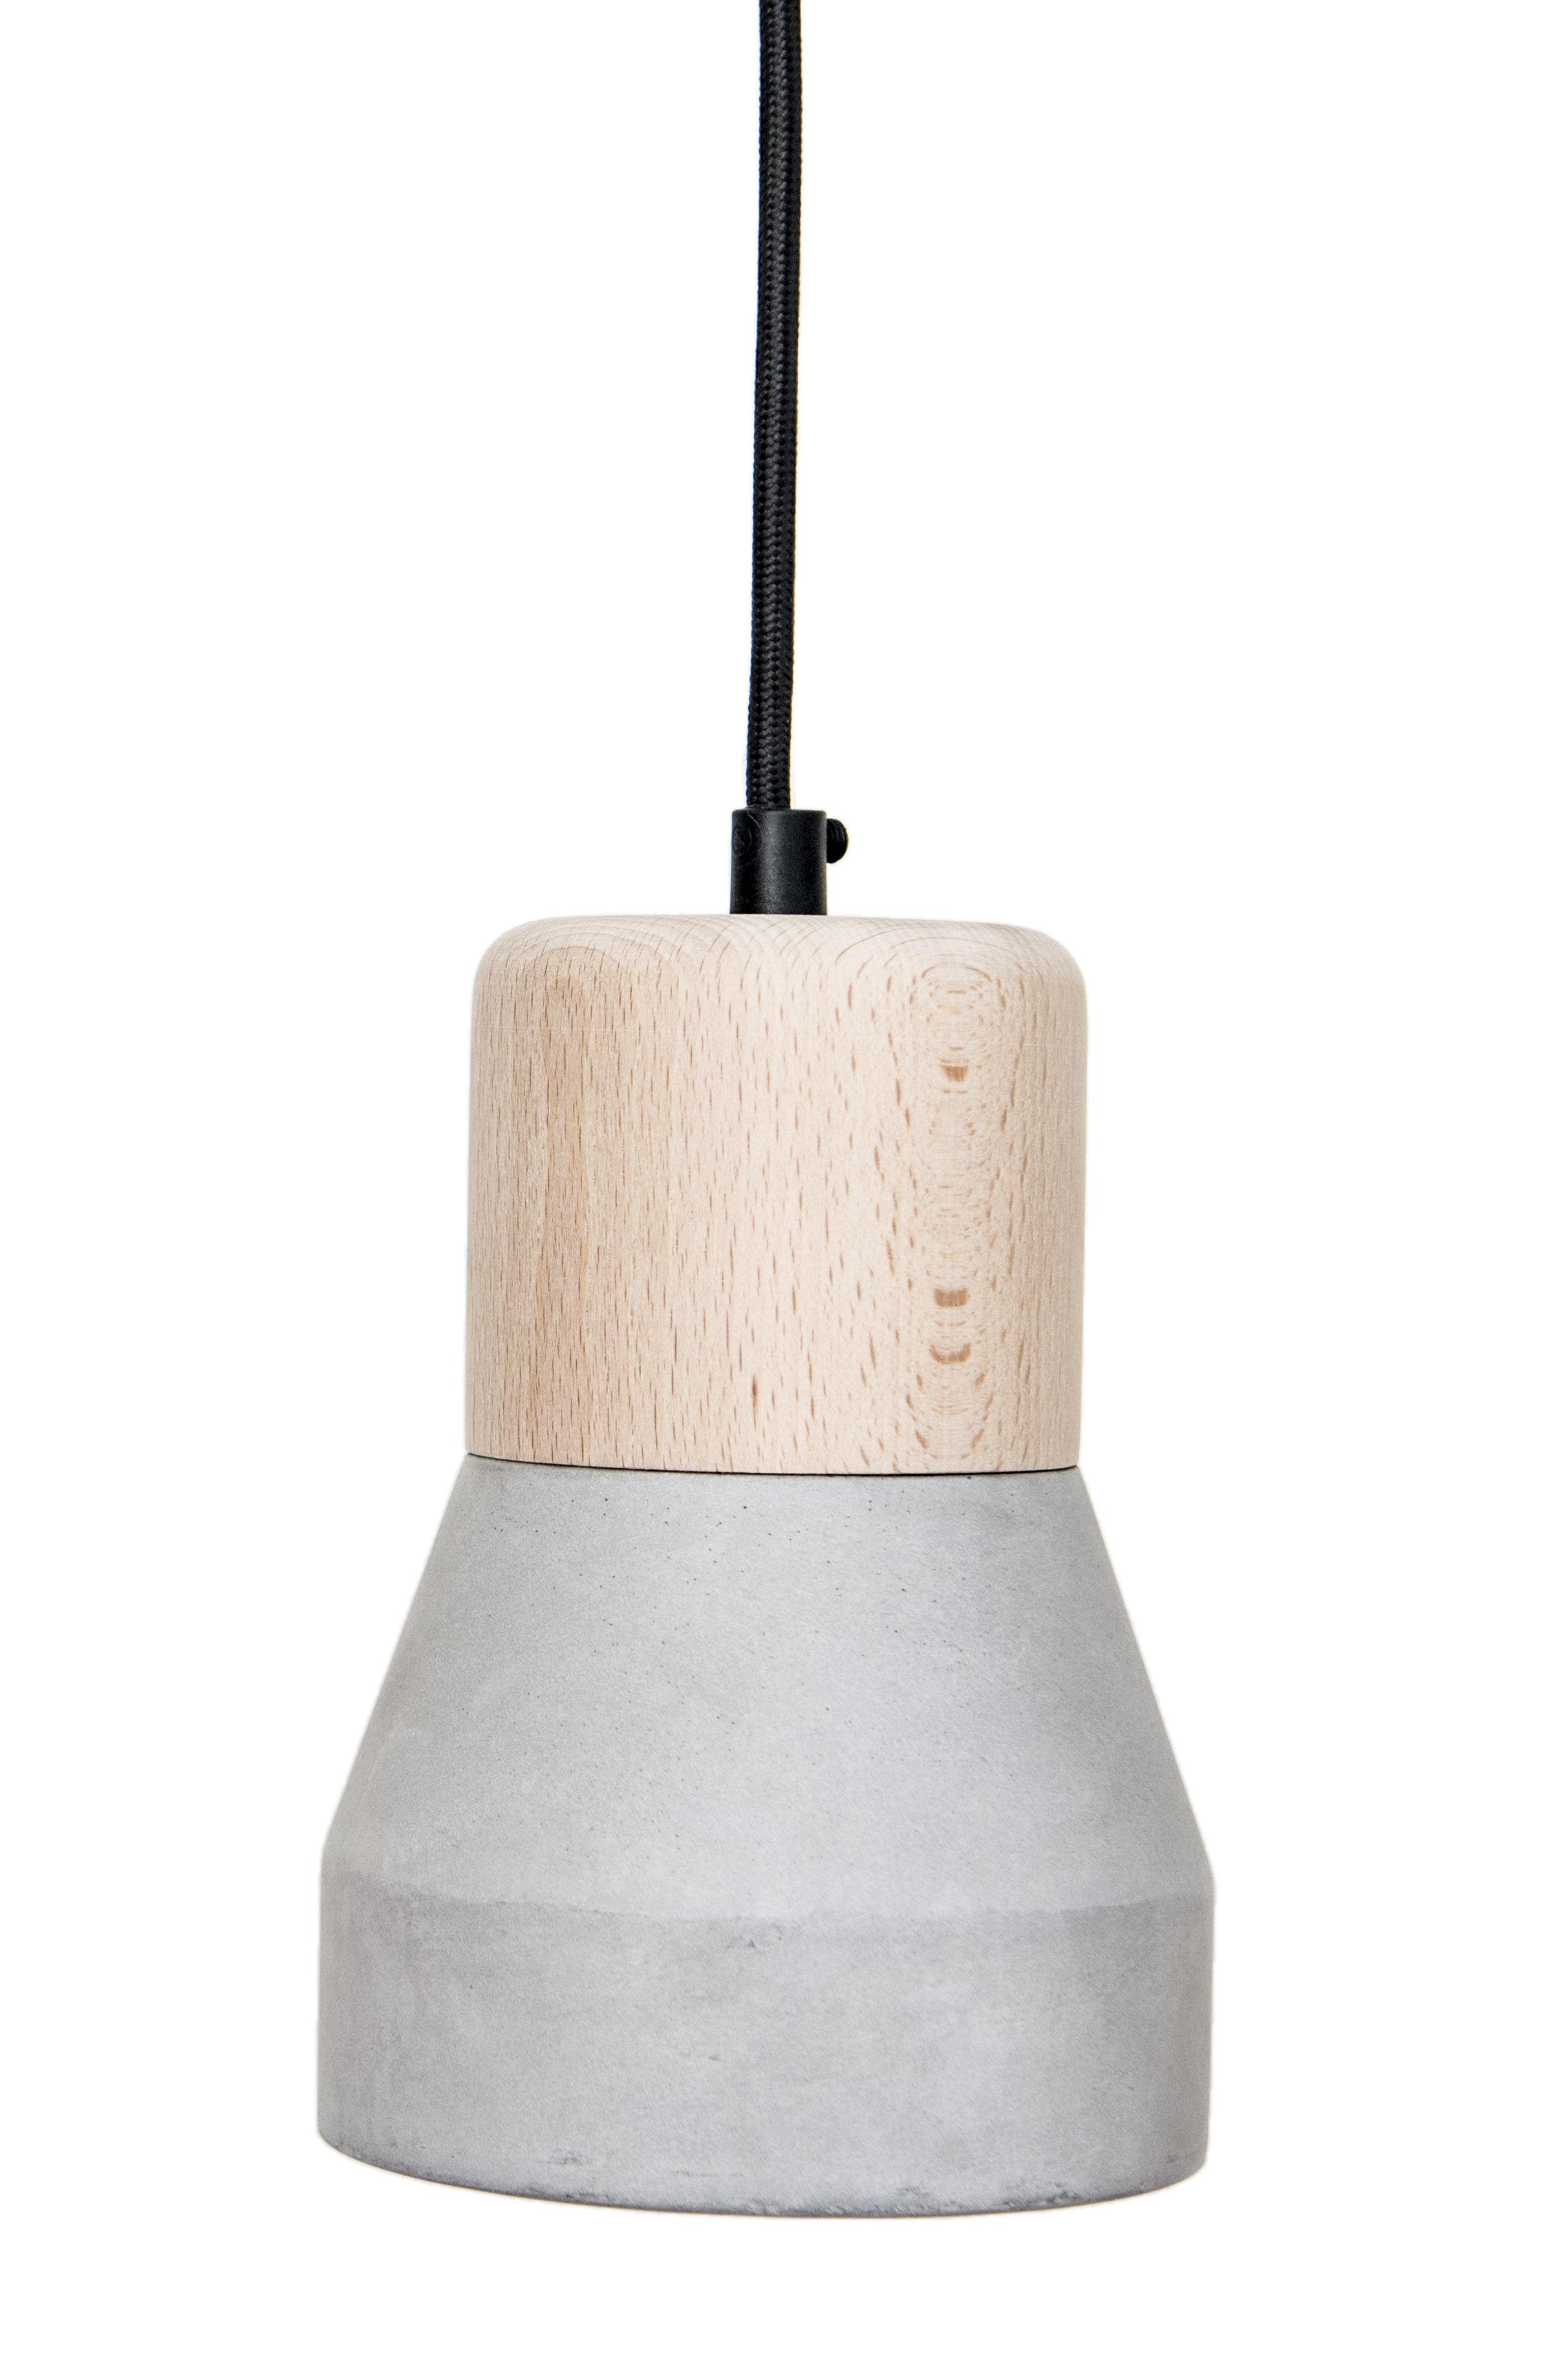 Lighting - Pendant Lighting - Cement Wood Pendant by Spécimen Editions - Wood / Bottom : grey concrete - Beechwood, Concrete